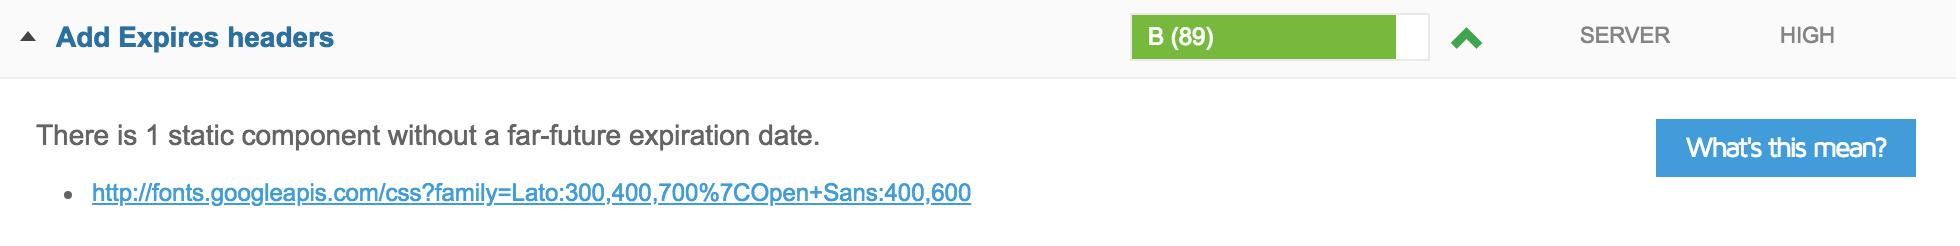 Scoring 100/100 in Google PageSpeed Insights, GTmetrix